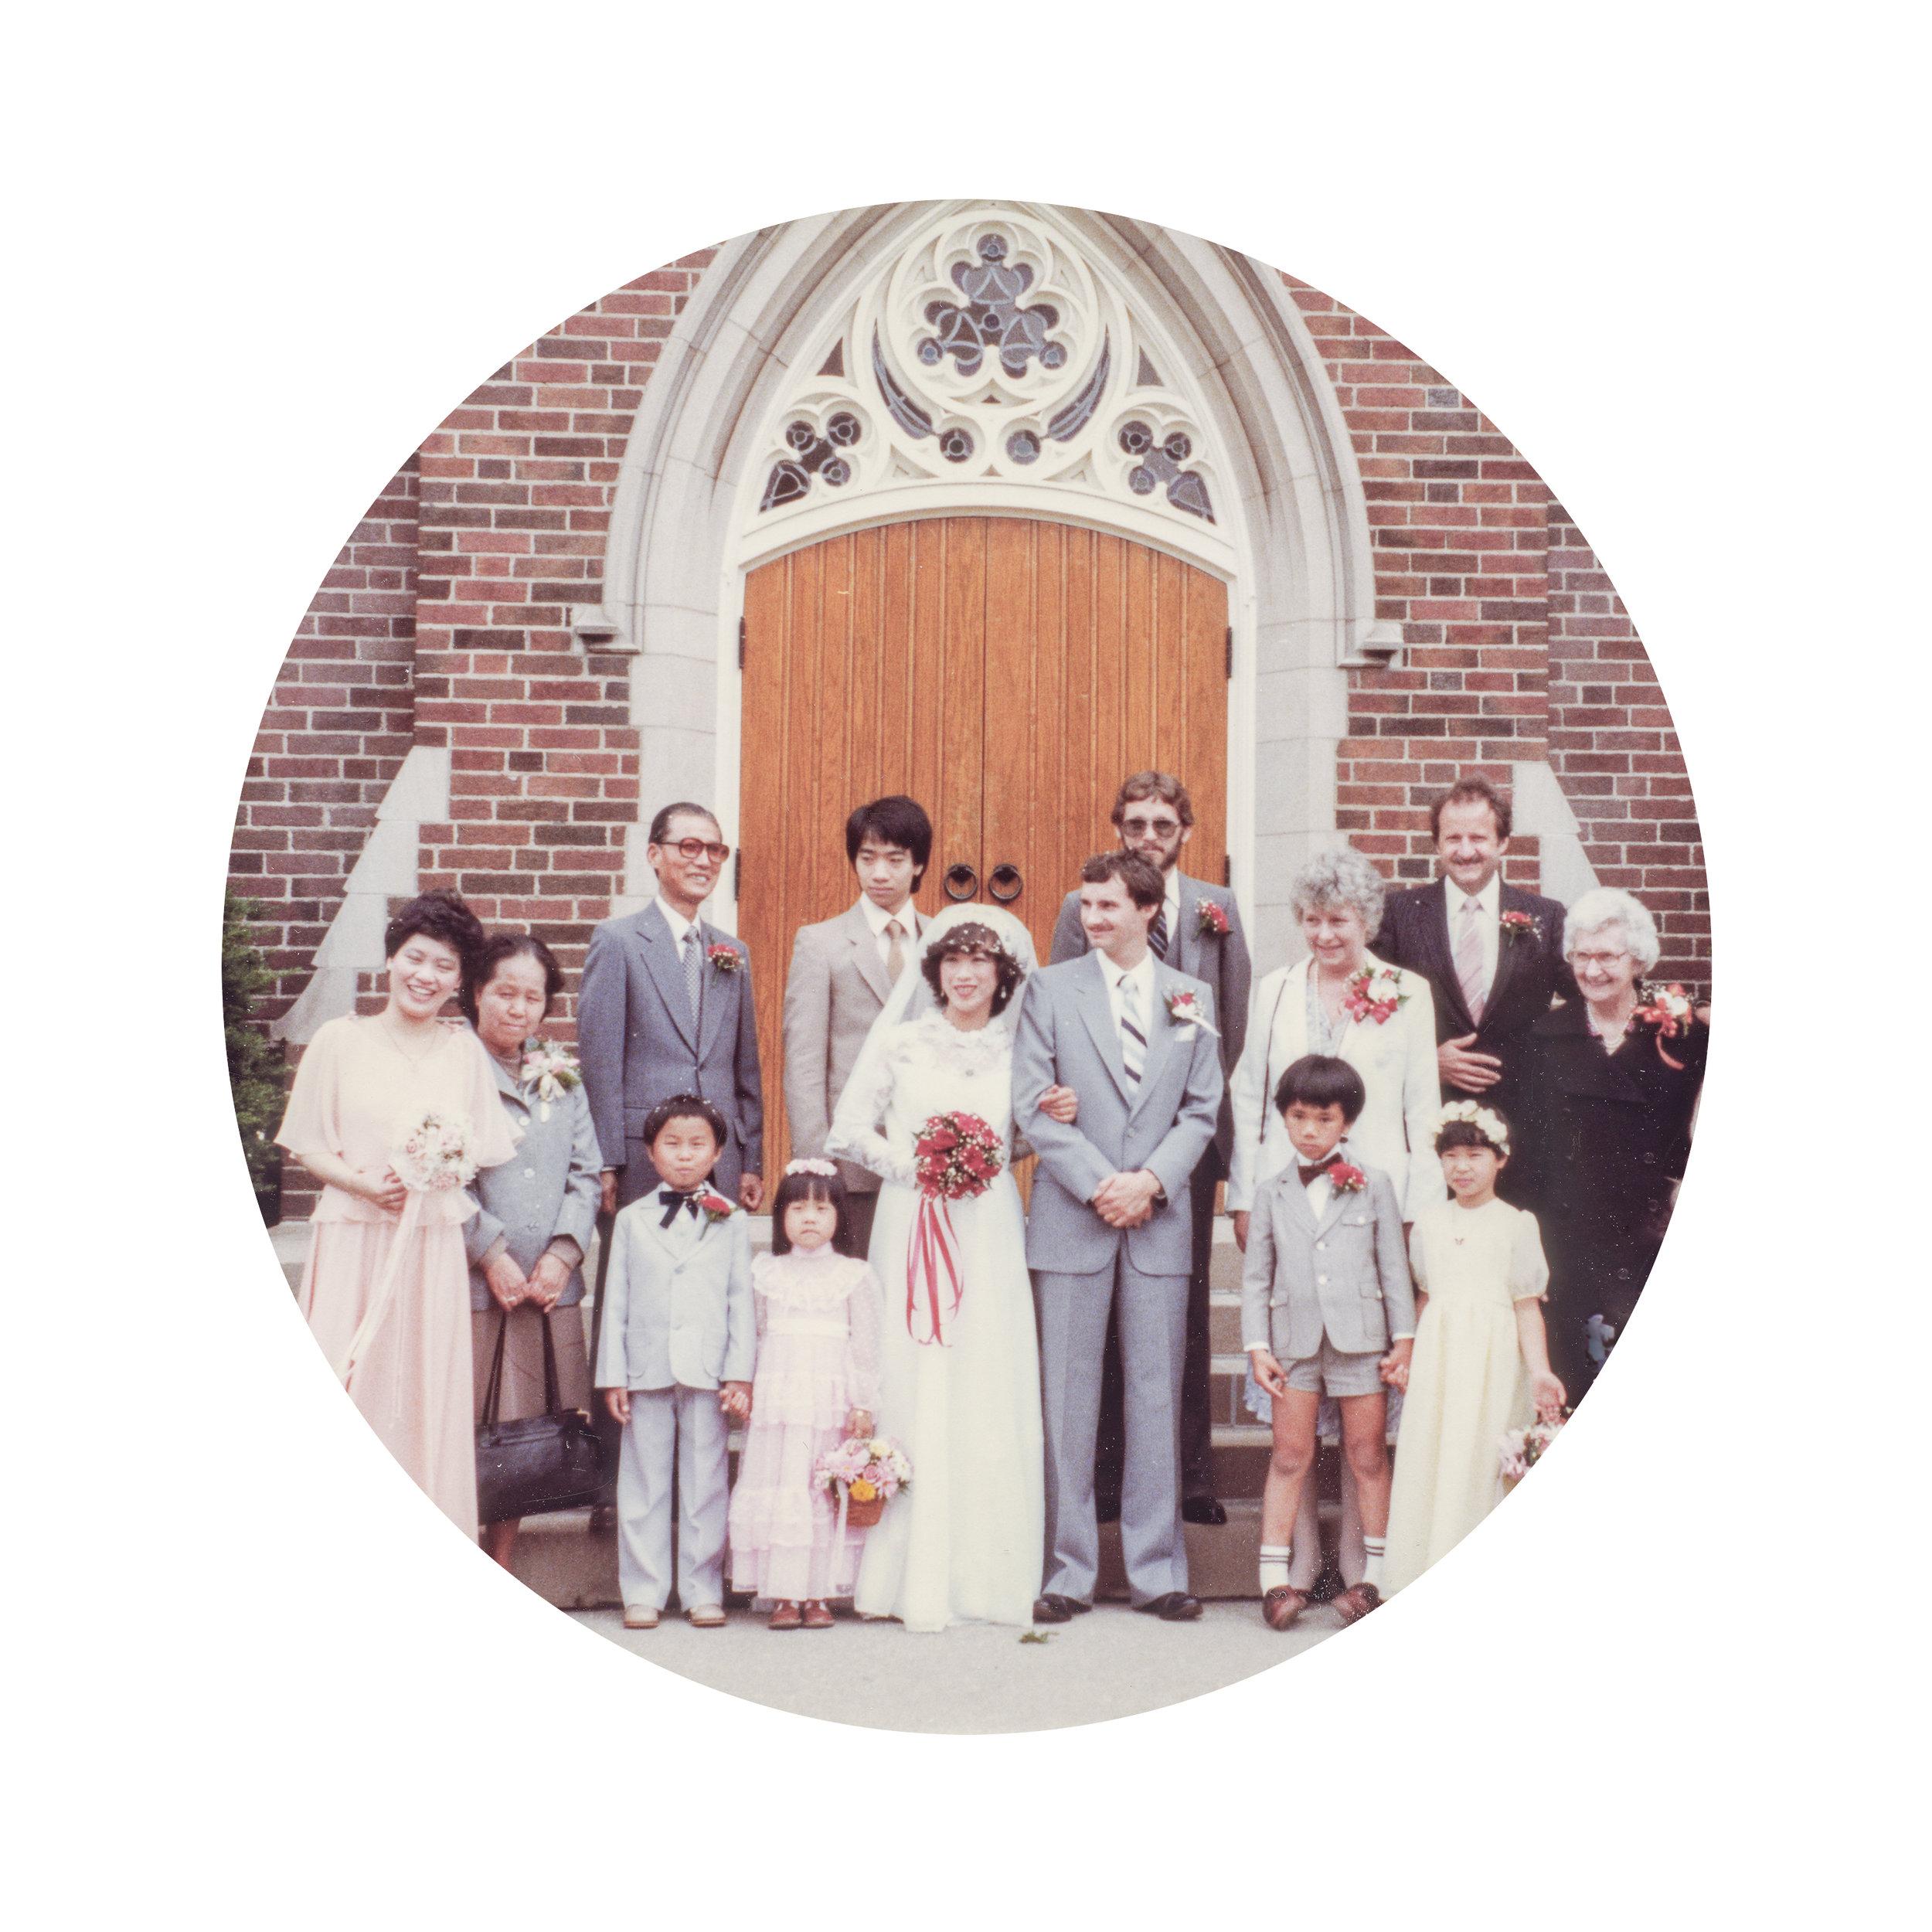 My Wedding, Toronto, 1982